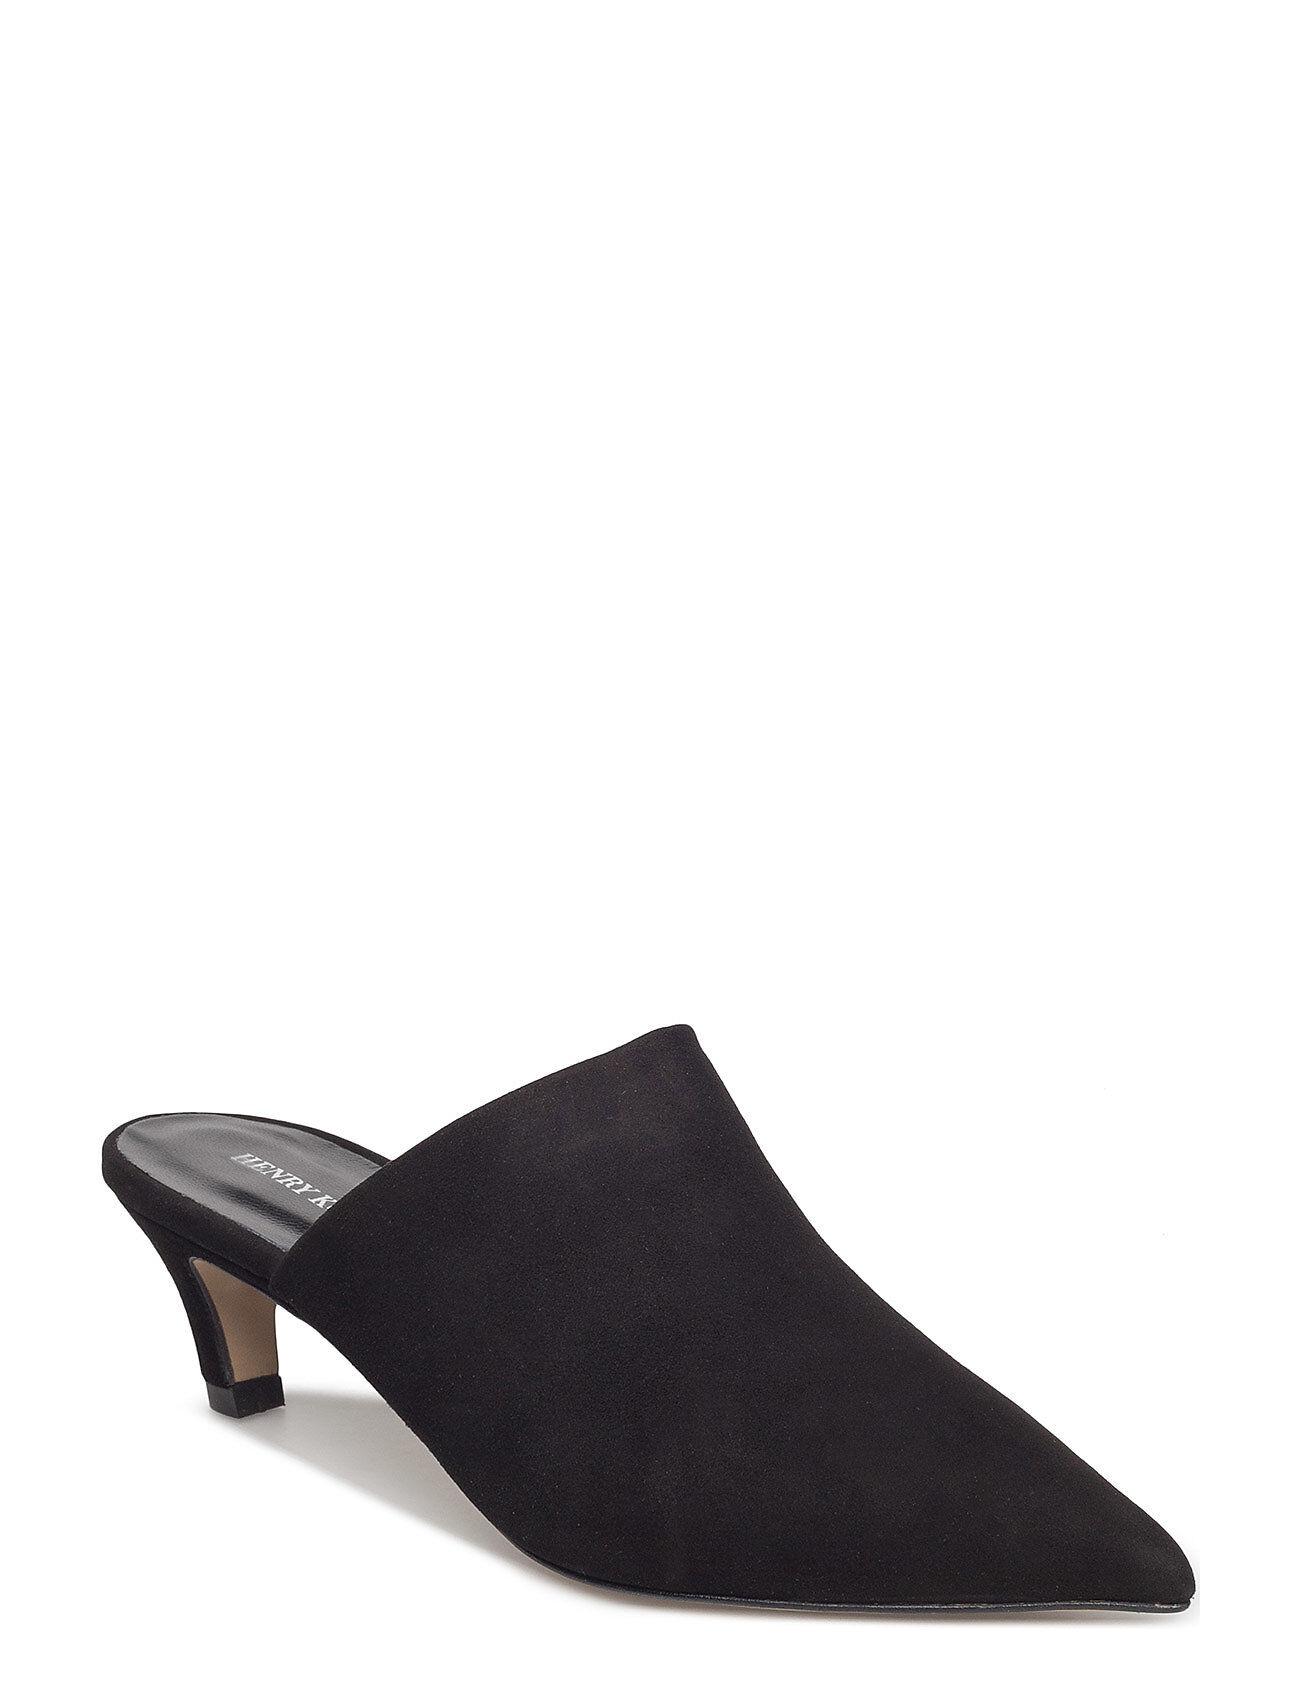 Henry Kole Lily Shoes Heels Pumps Classic Musta Henry Kole